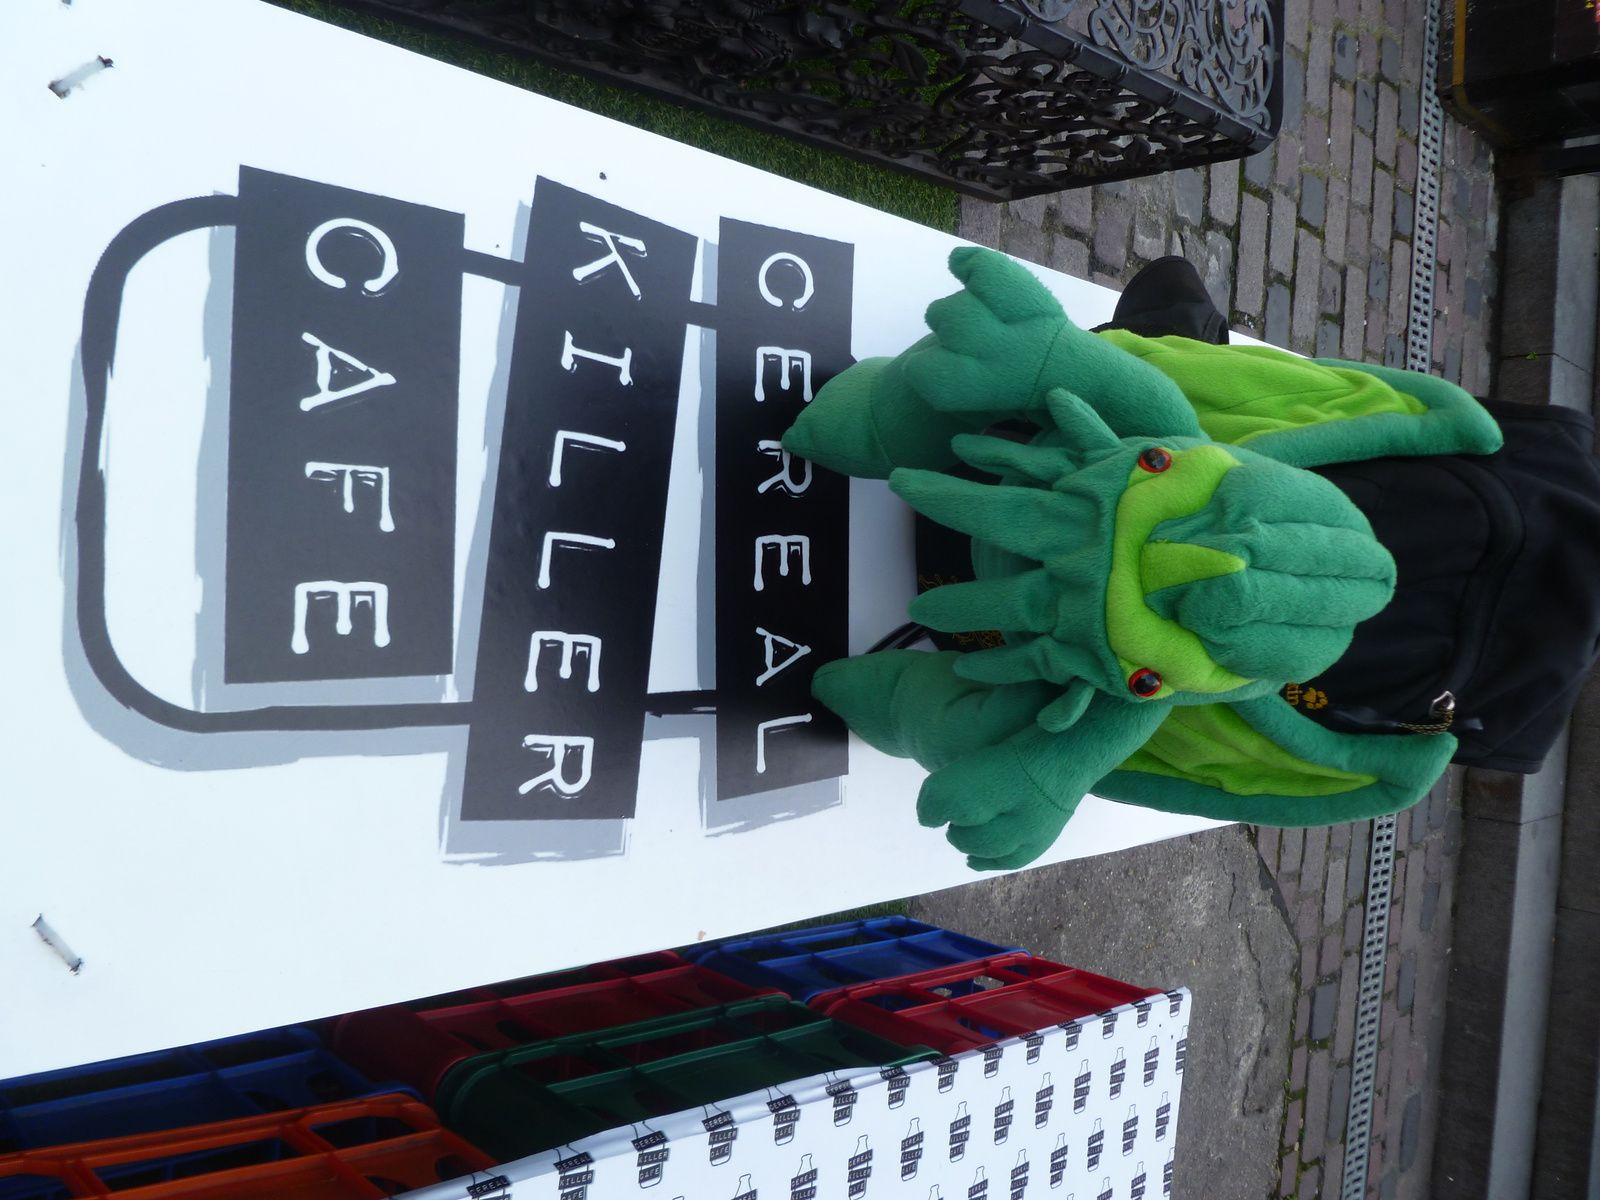 Cthulhu pose devant le Cereal Killer Café...